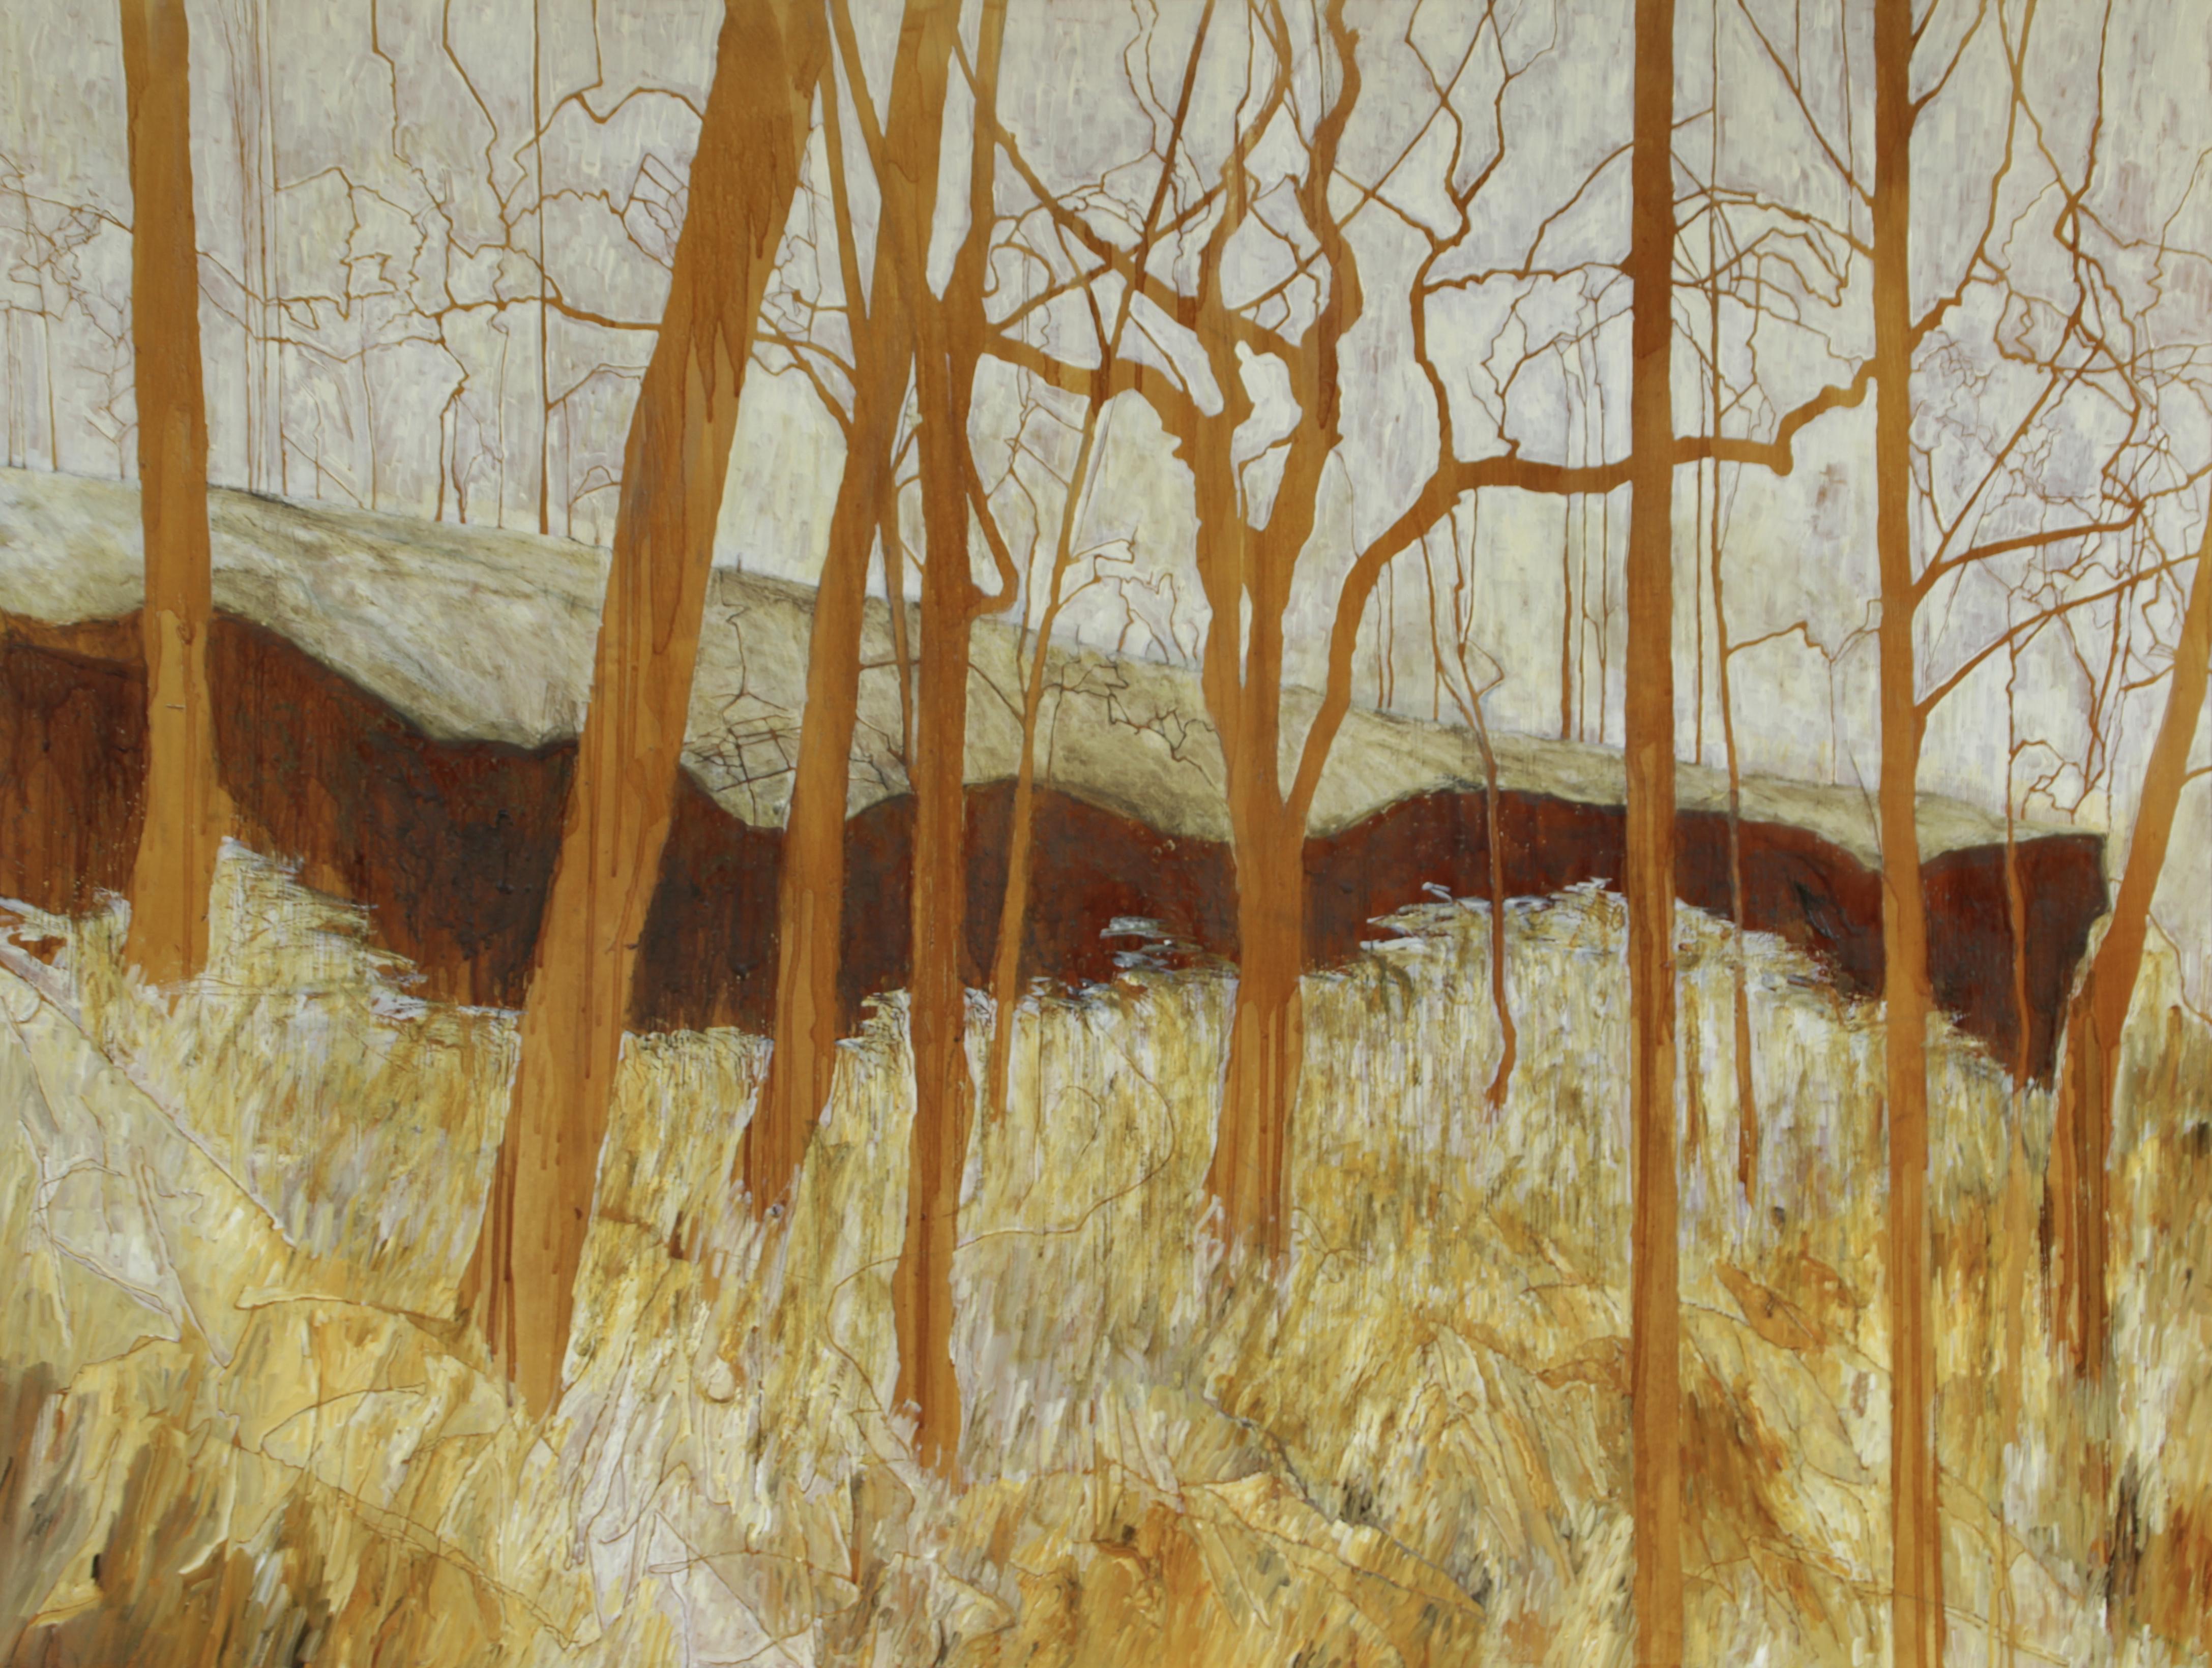 Sandstone cave, Watagans, 90 x 120 cm